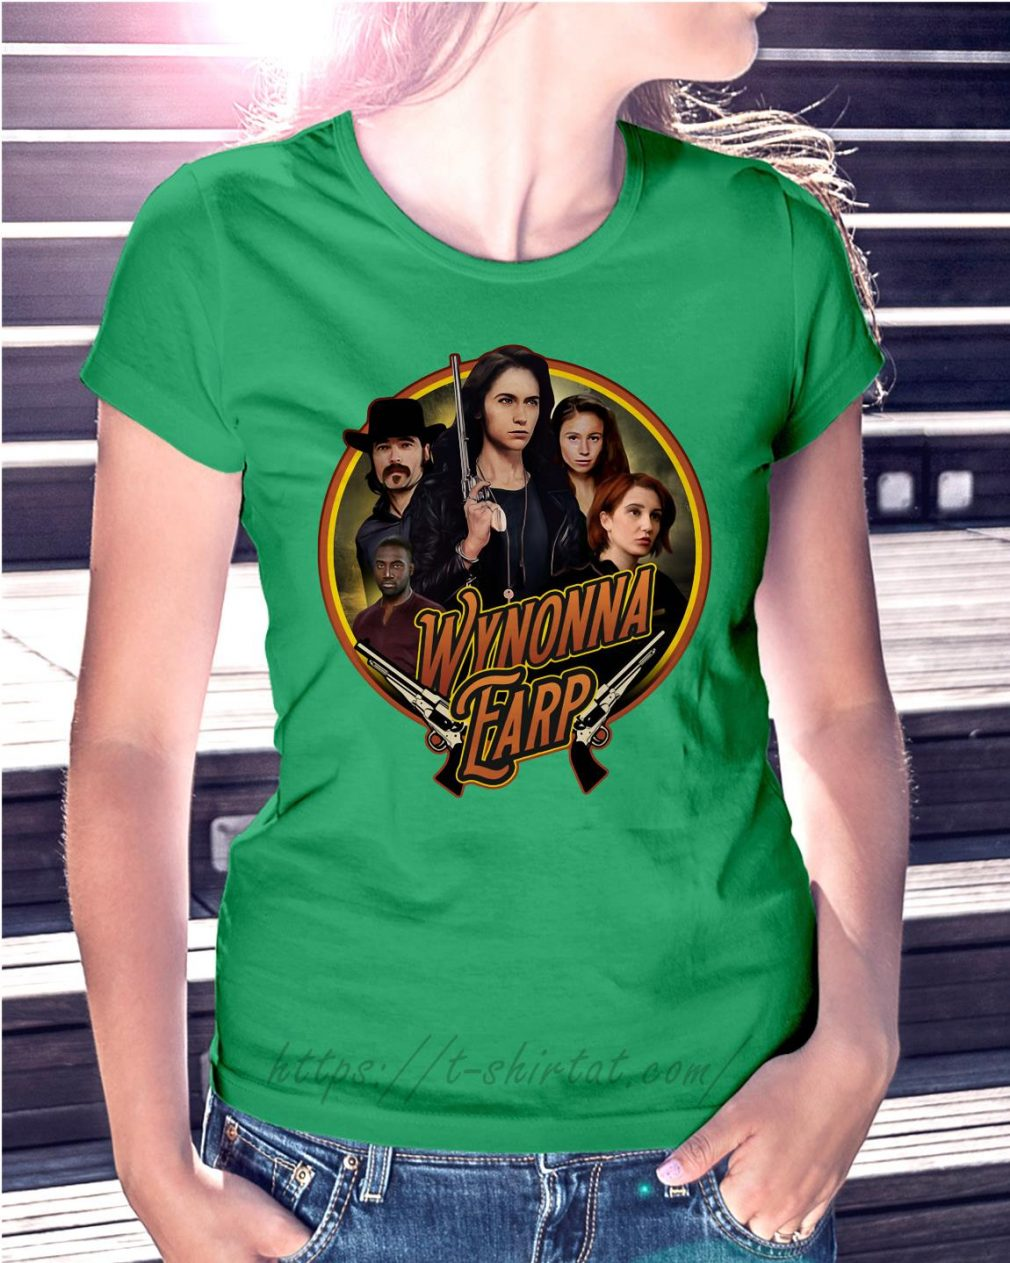 Official Wynonna Earp Ladies Tee green